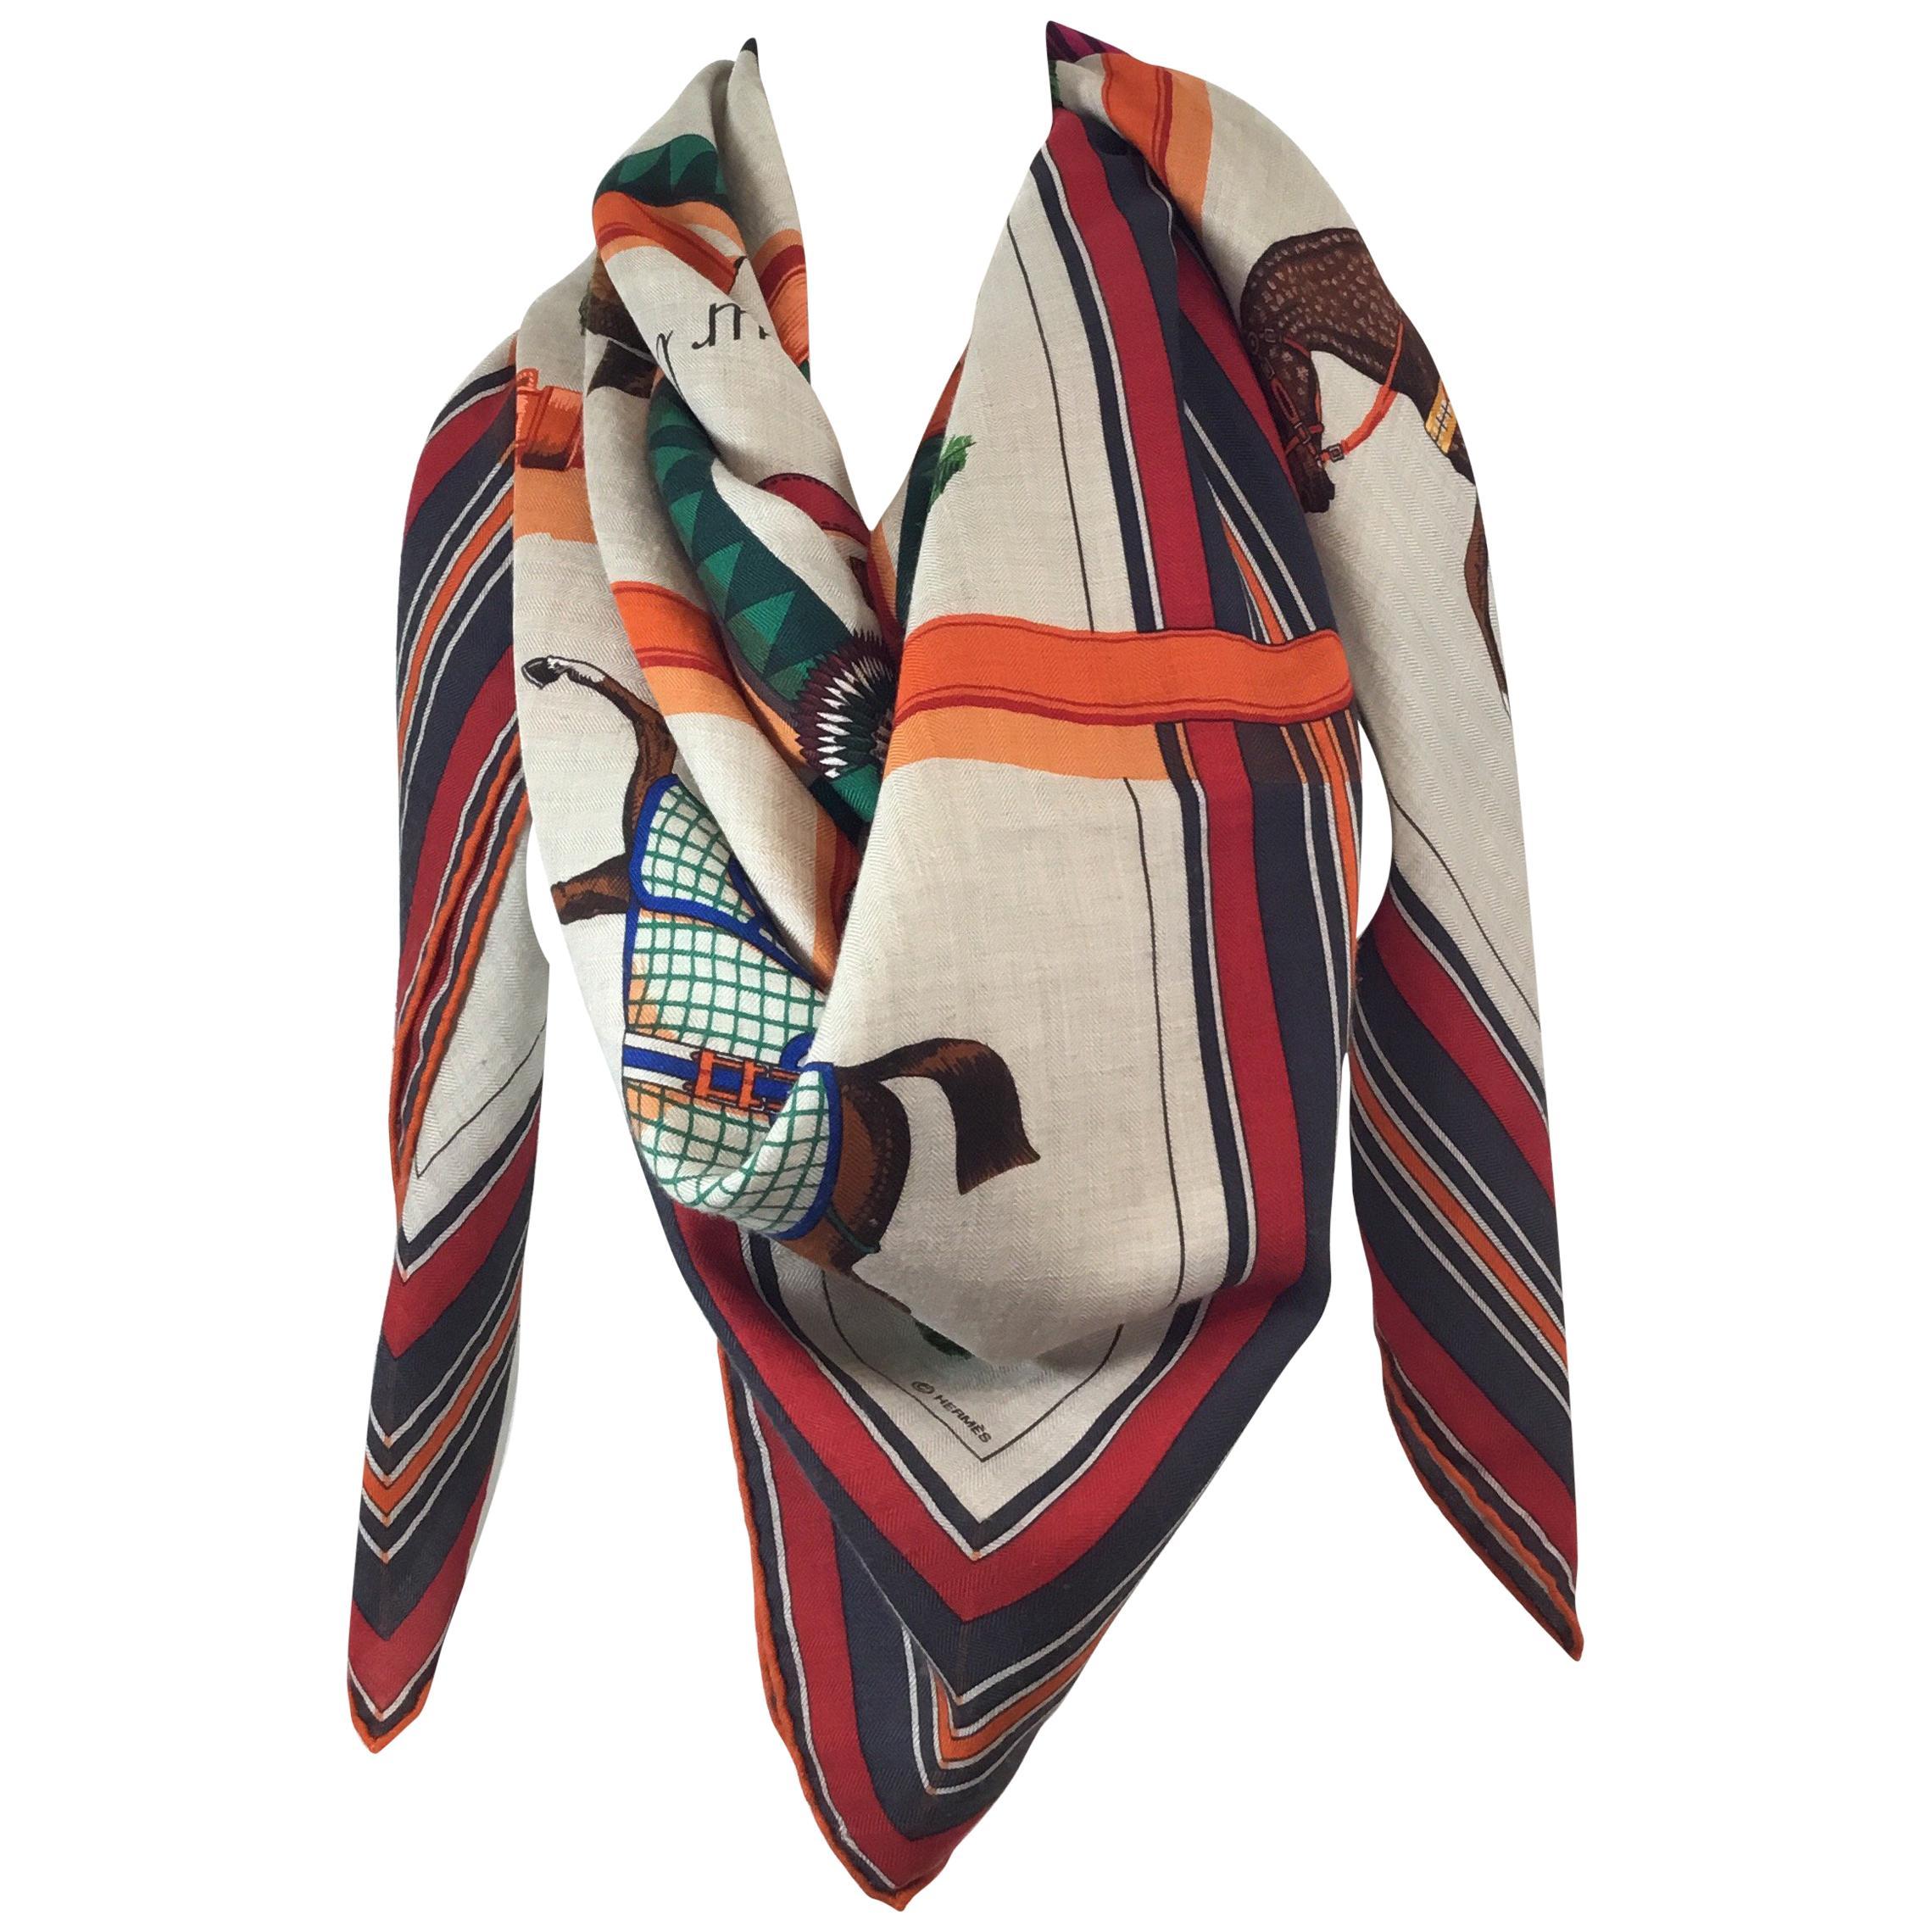 6a5e375aff563 Hermes Couvertures et Tenues de Jour Shawl in Cashmere/Silk at 1stdibs